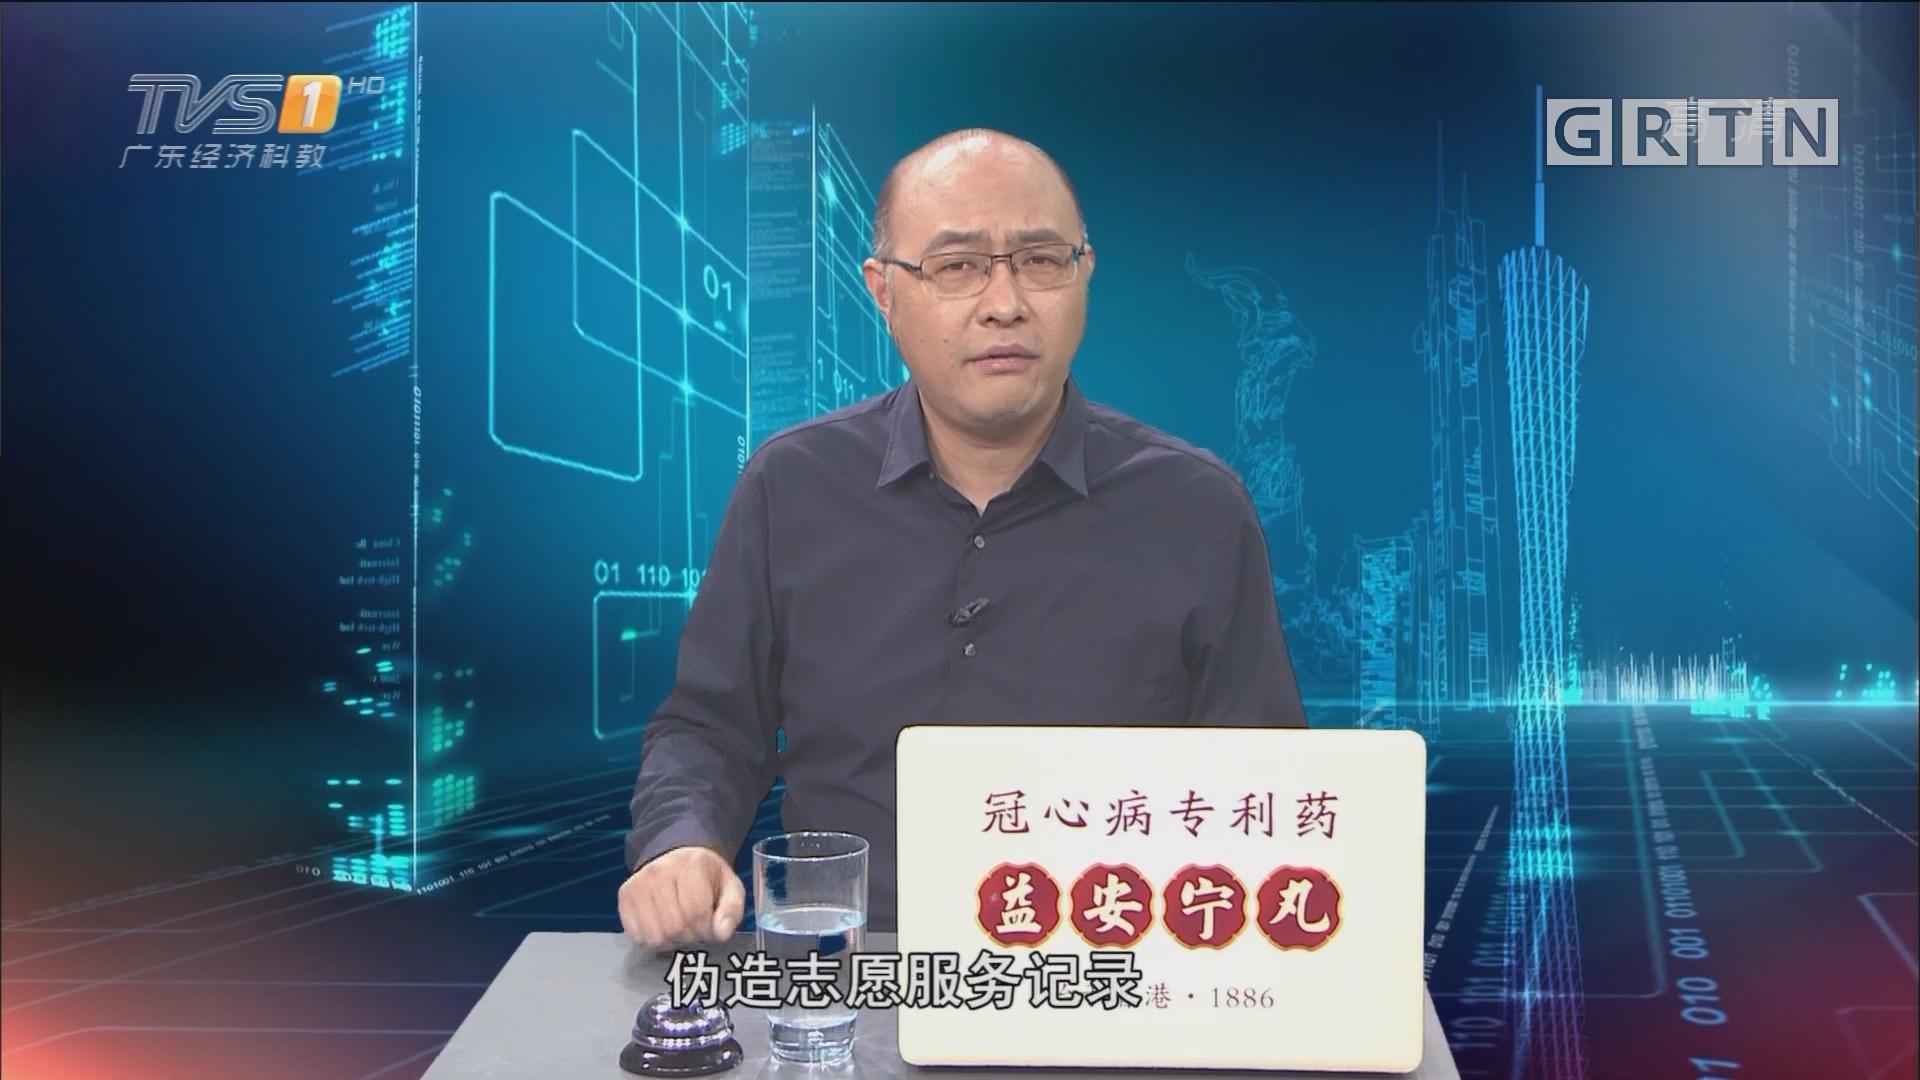 [HD][2017-08-01]马后炮:志愿服务时长成了网店商品 我们该反思什么